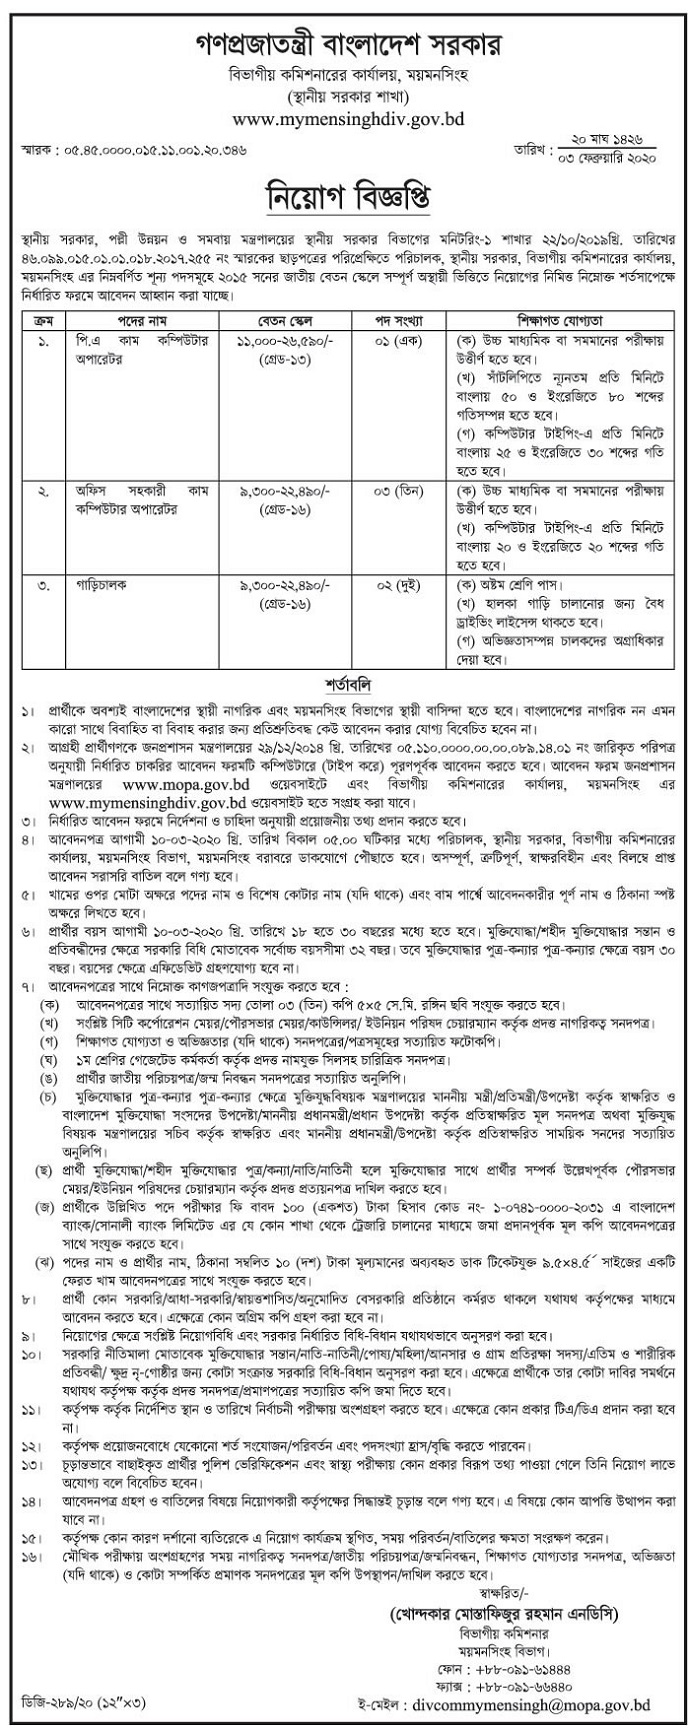 Divisional Commissioner's Office Job Circular 2020